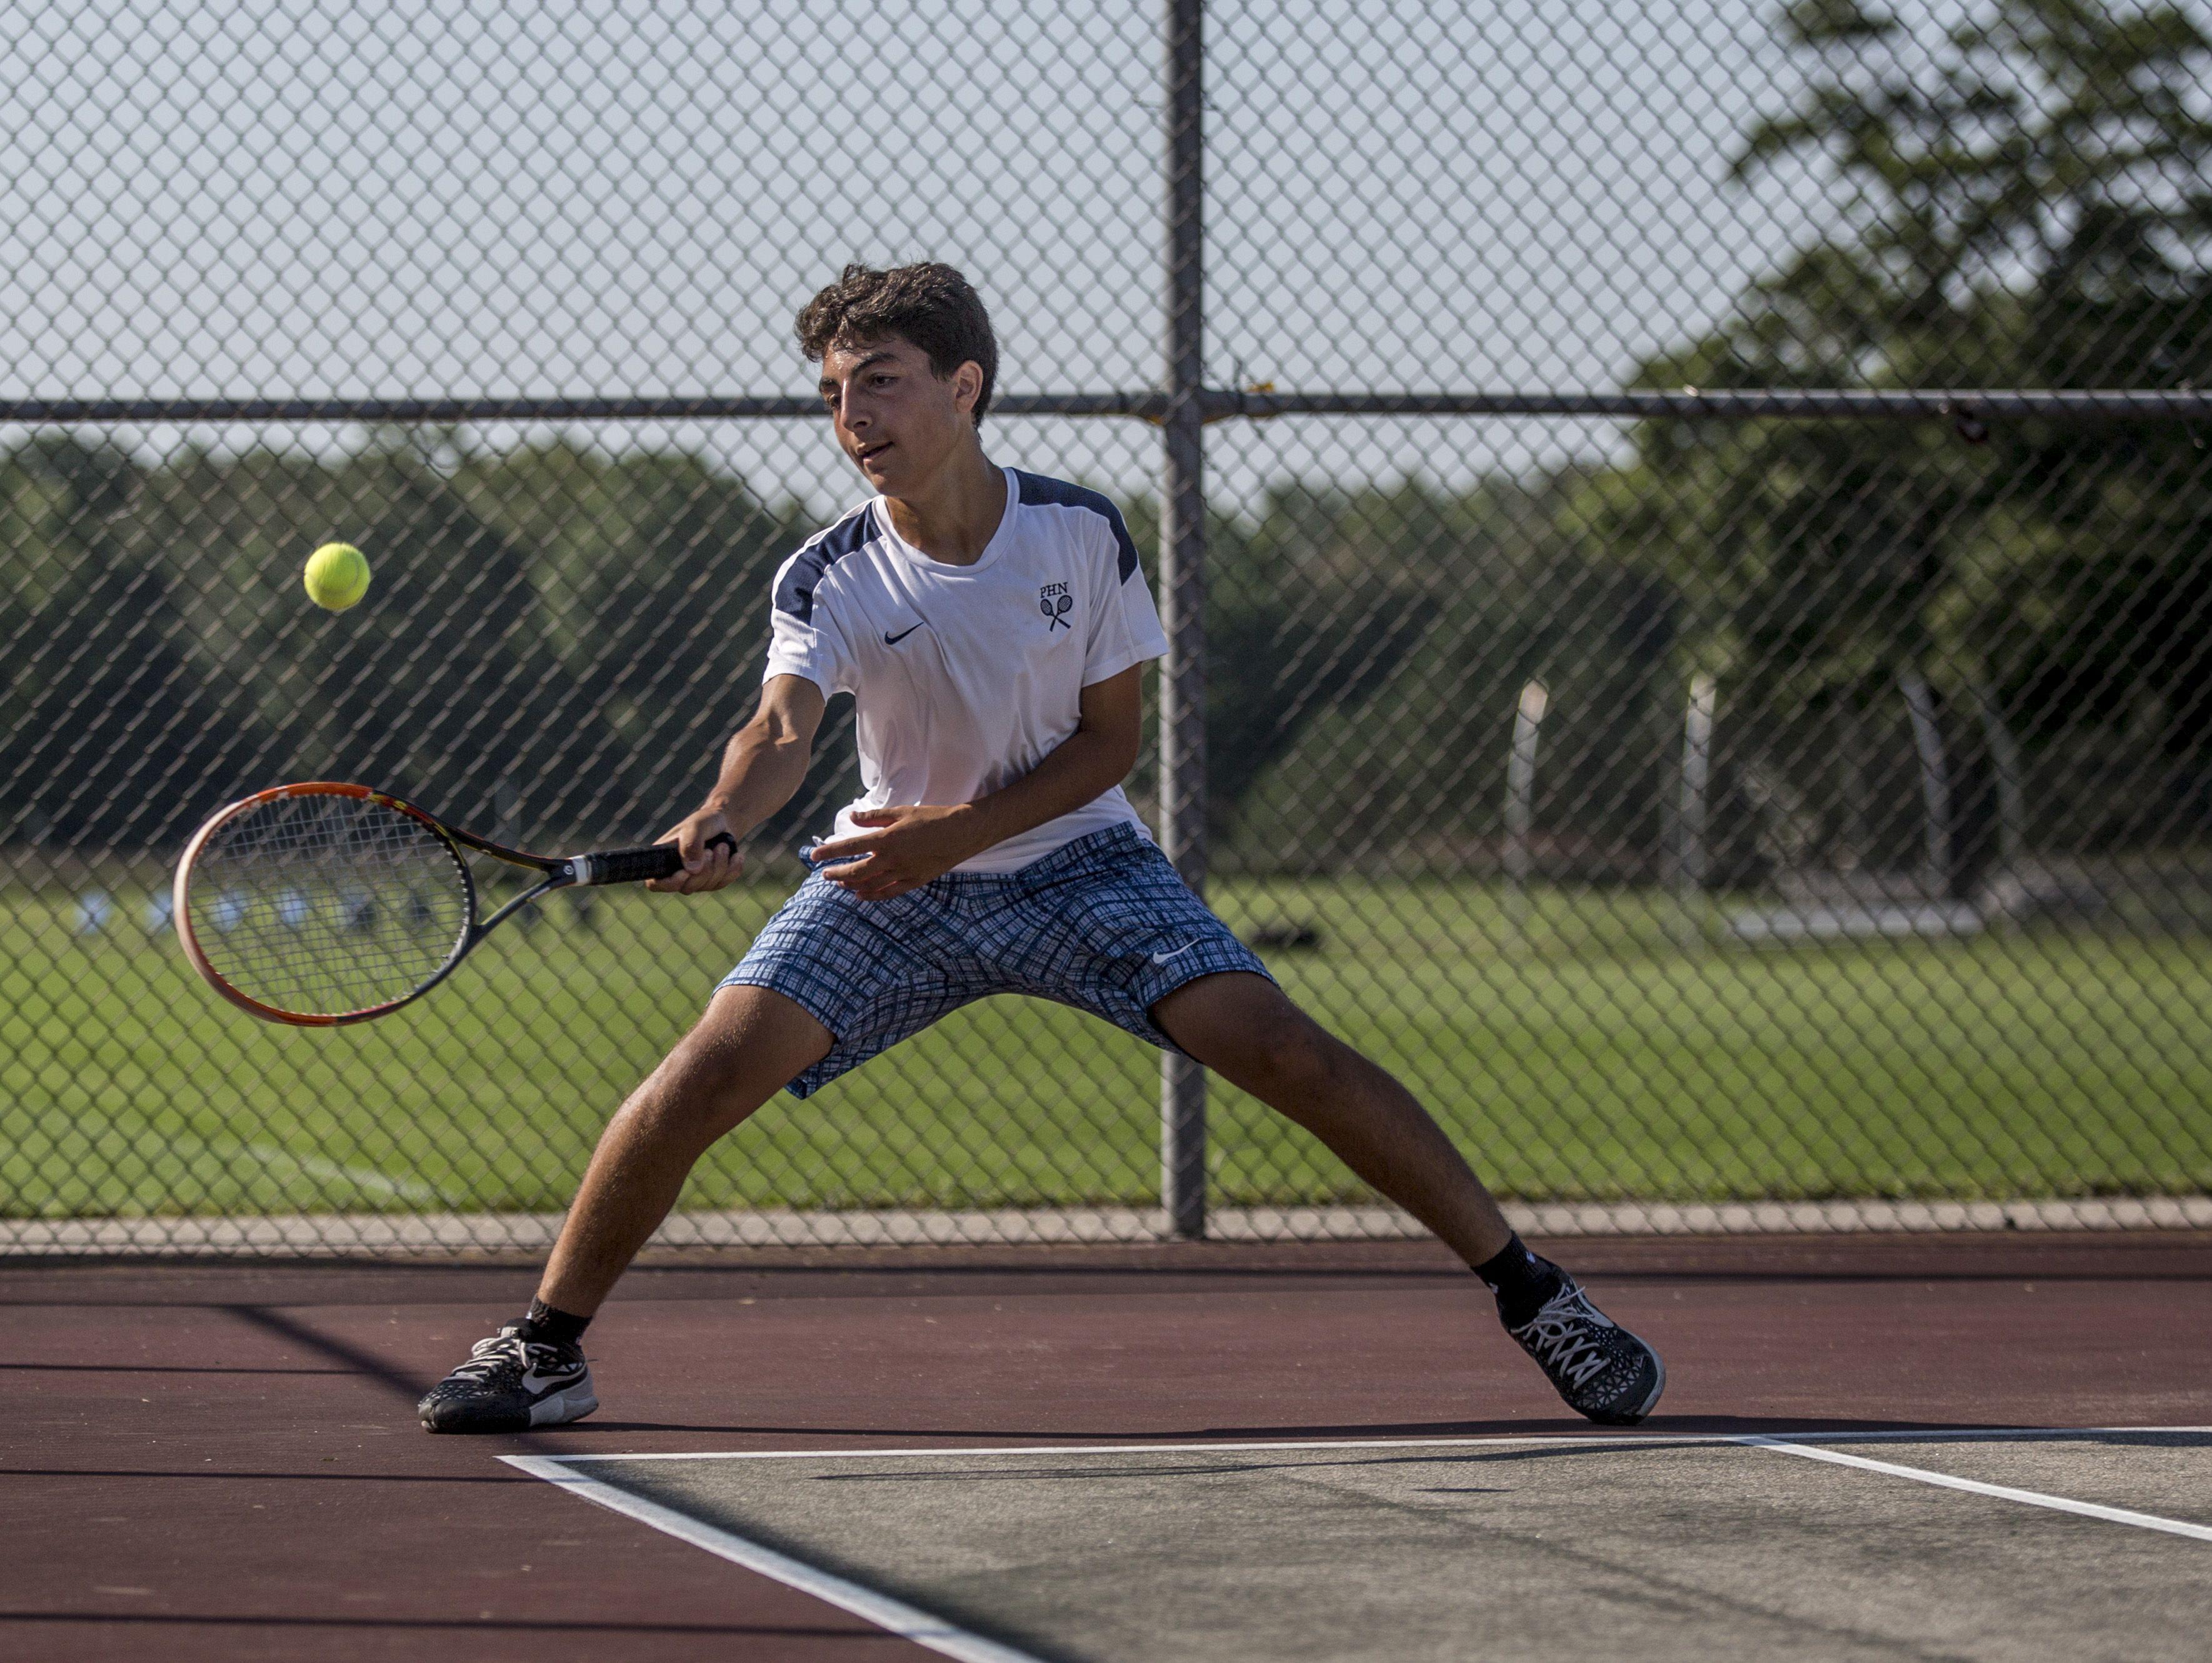 Port Huron Northern's Mina Naguib returns the ball during tennis practice Tuesday, August 30, 2016 at Port Huron Northern High School.